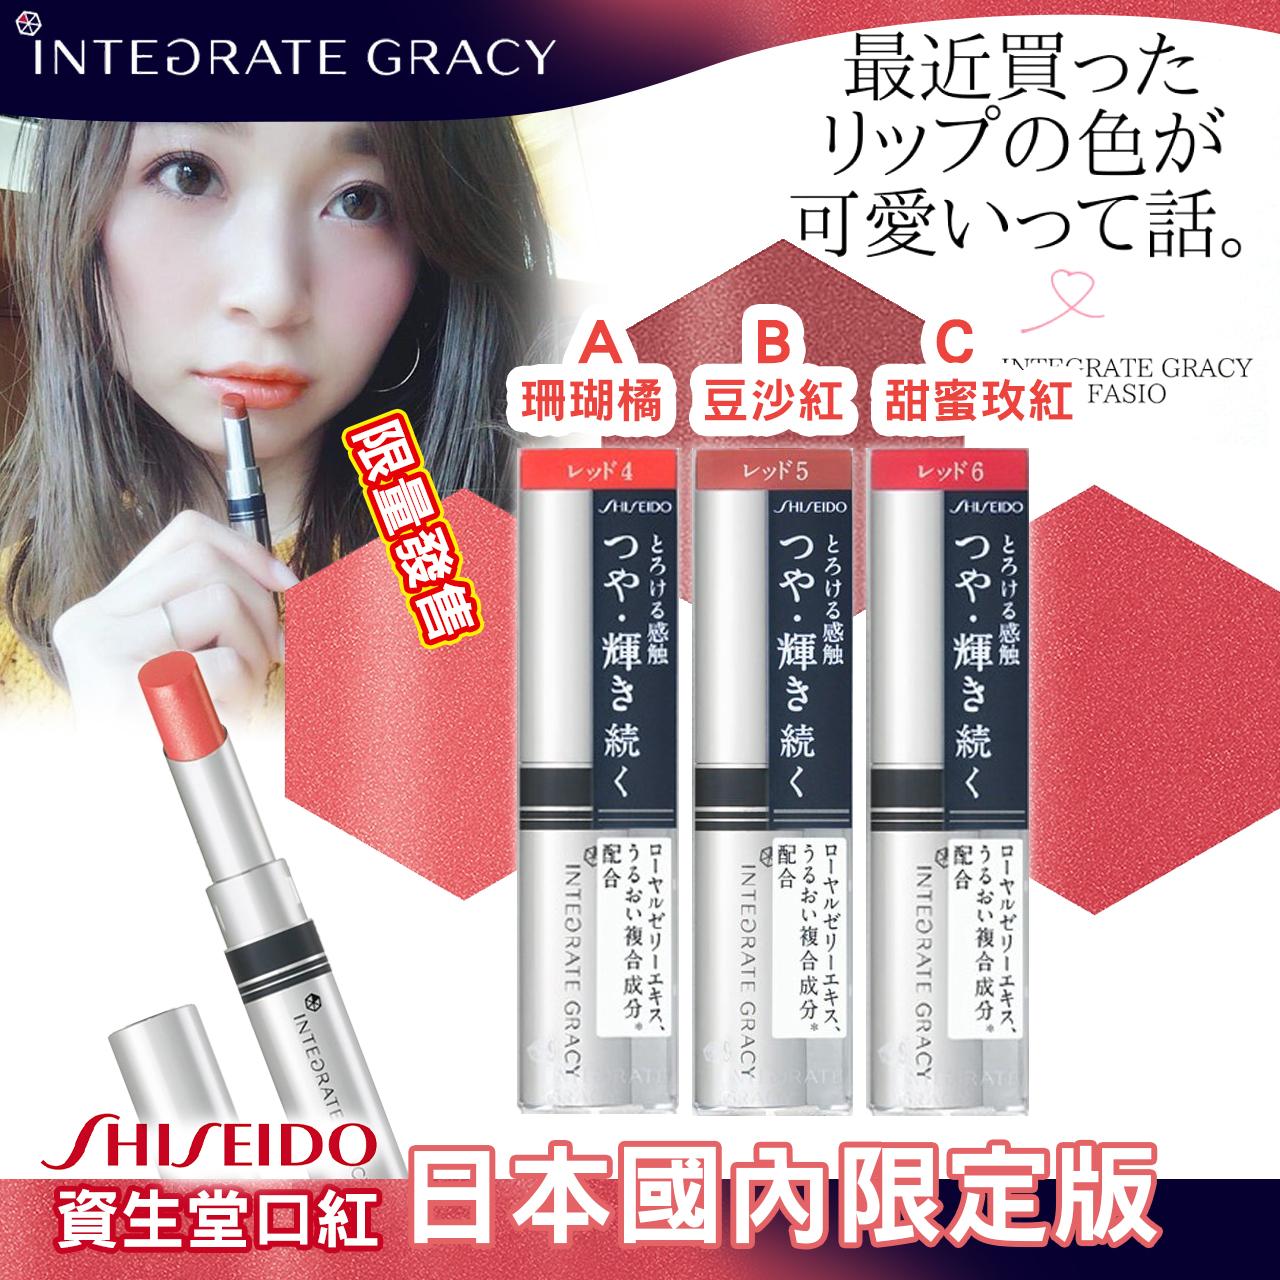 《HOYA-Life日本生活館》日本製 SHISEIDO 資生堂INTEGRATE GRACY 水潤 保濕 唇膏 口紅